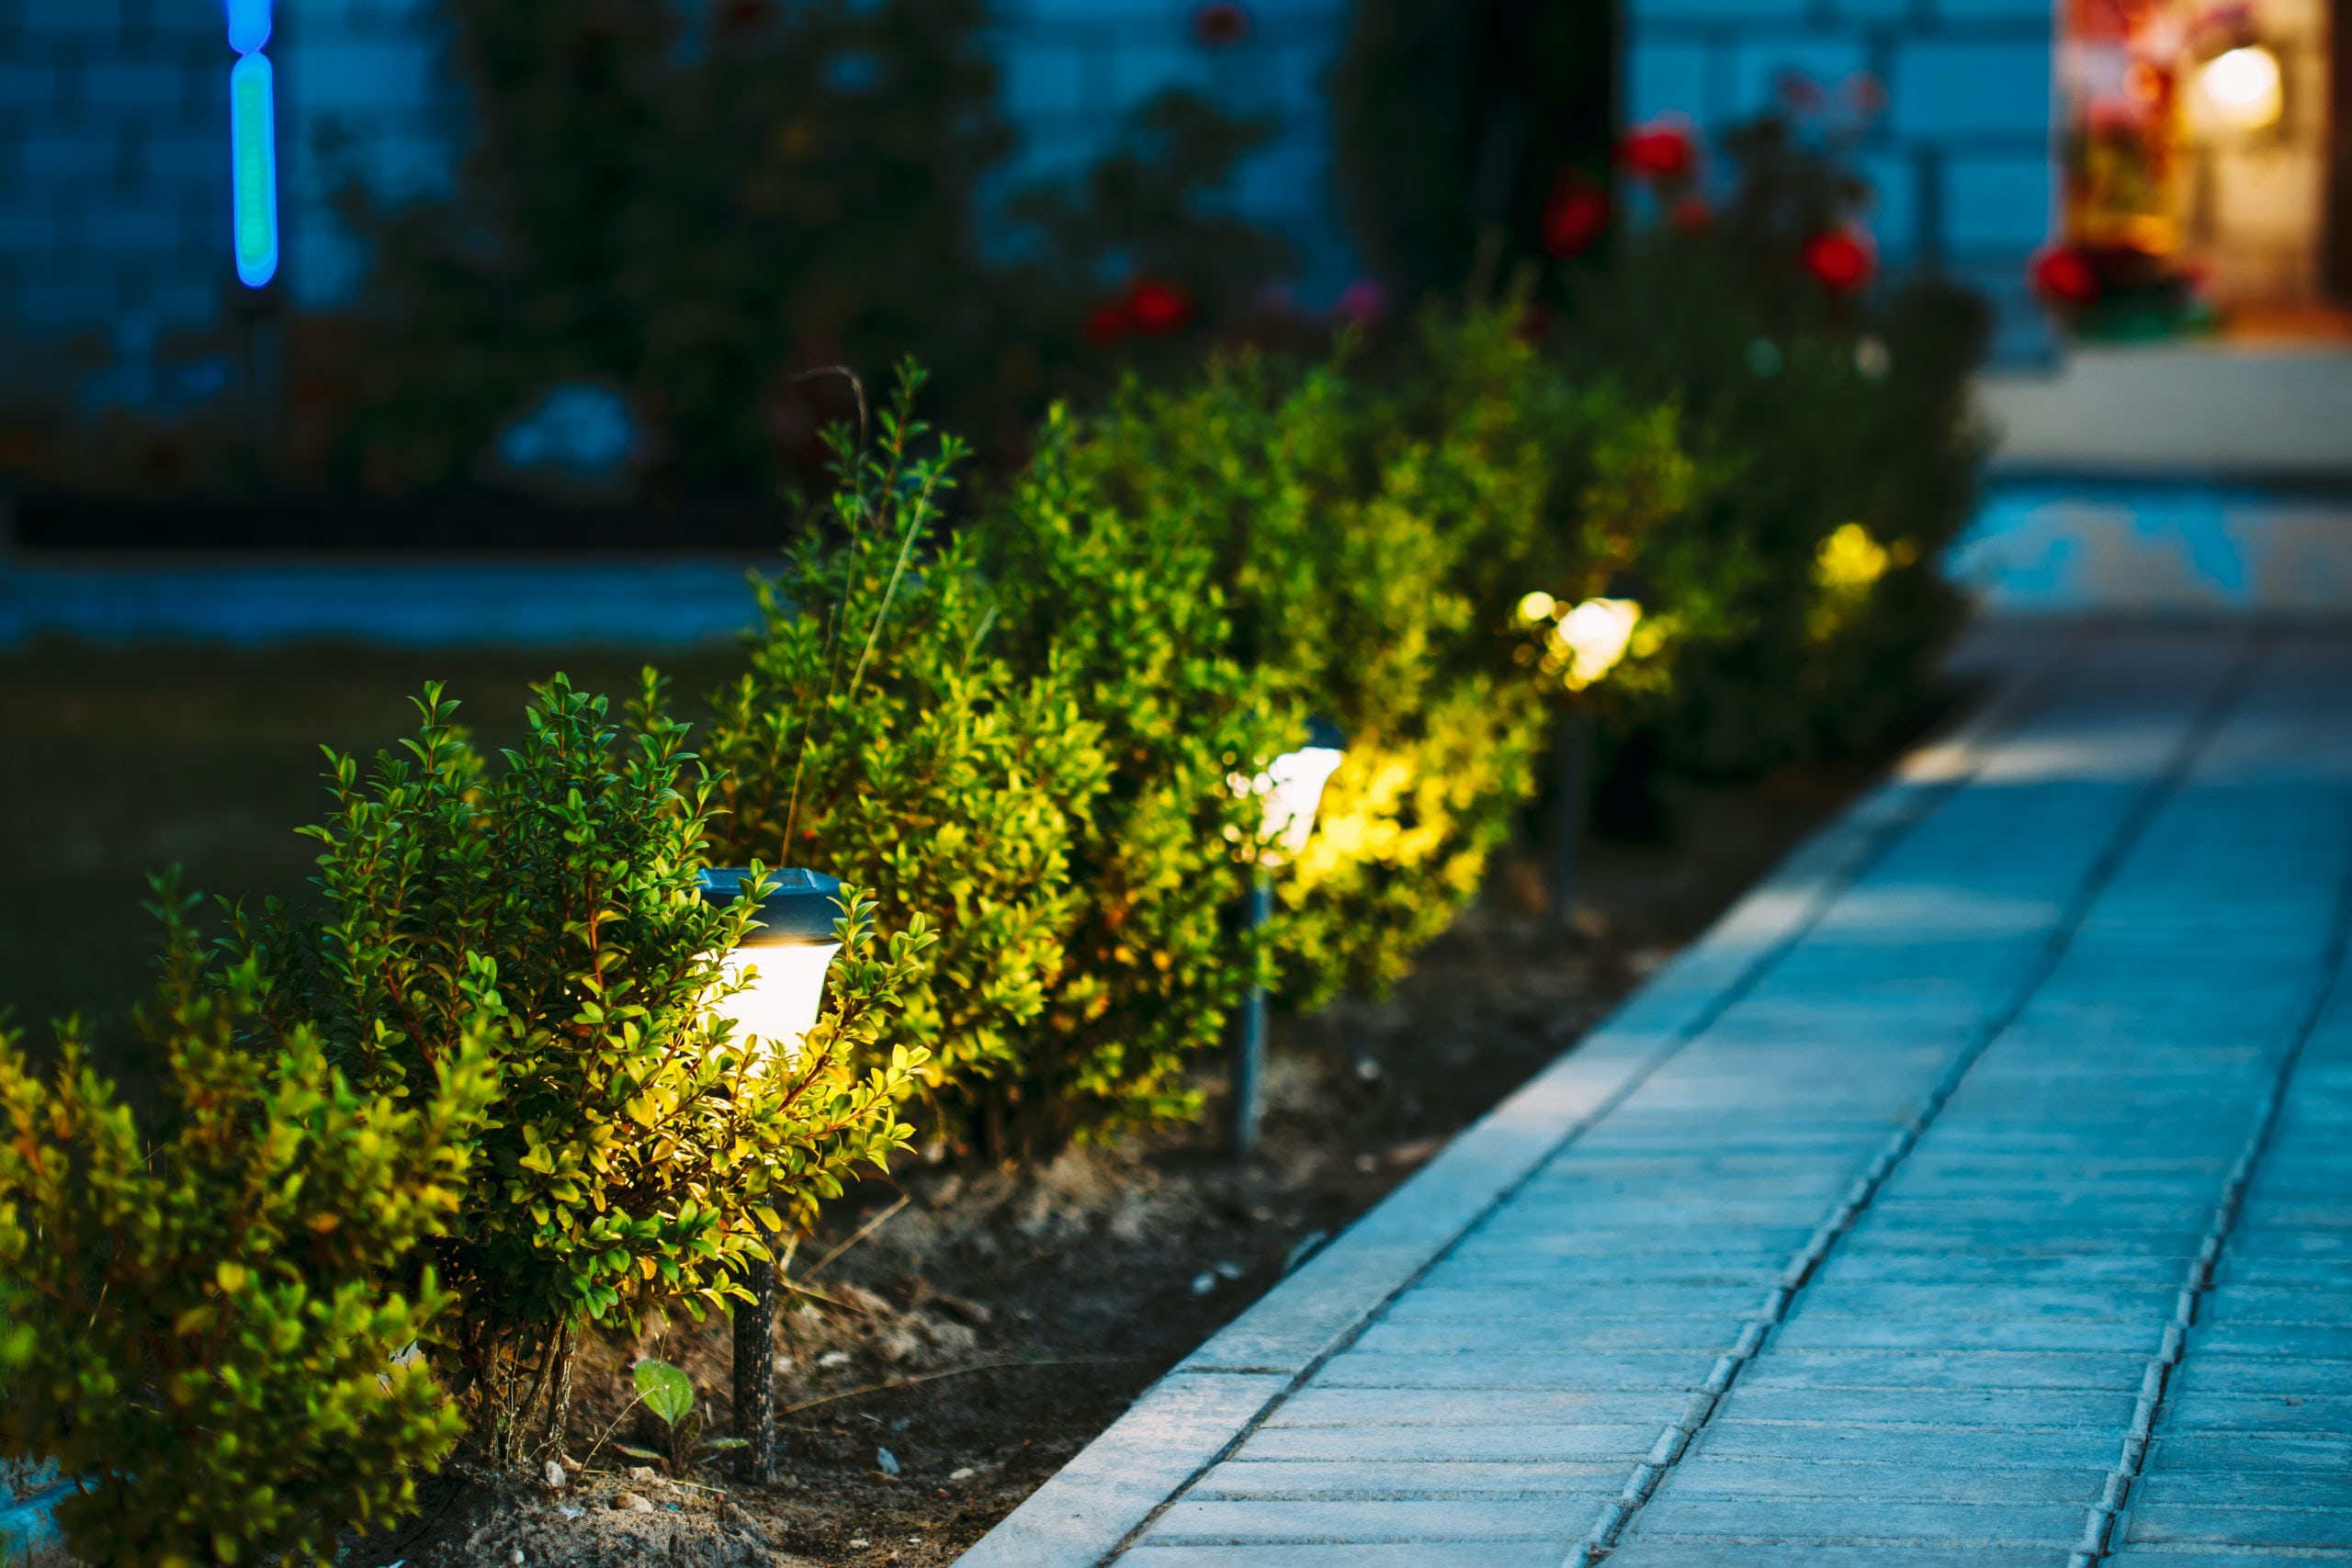 solar power walkway light